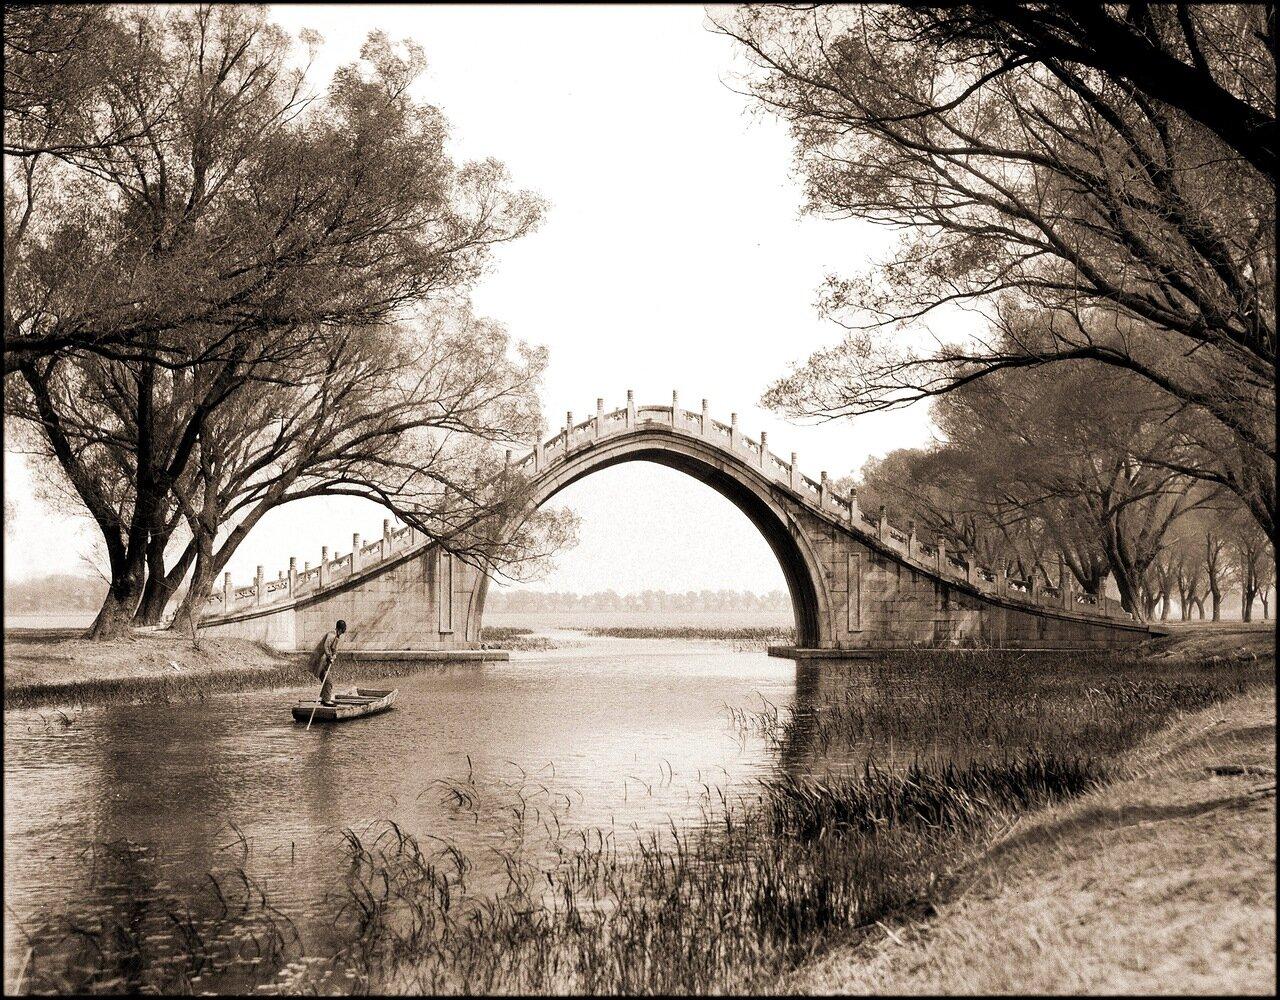 1924. Юйдайцяо (Мост нефритового пояса) и лодка, Летний дворец, Пекин